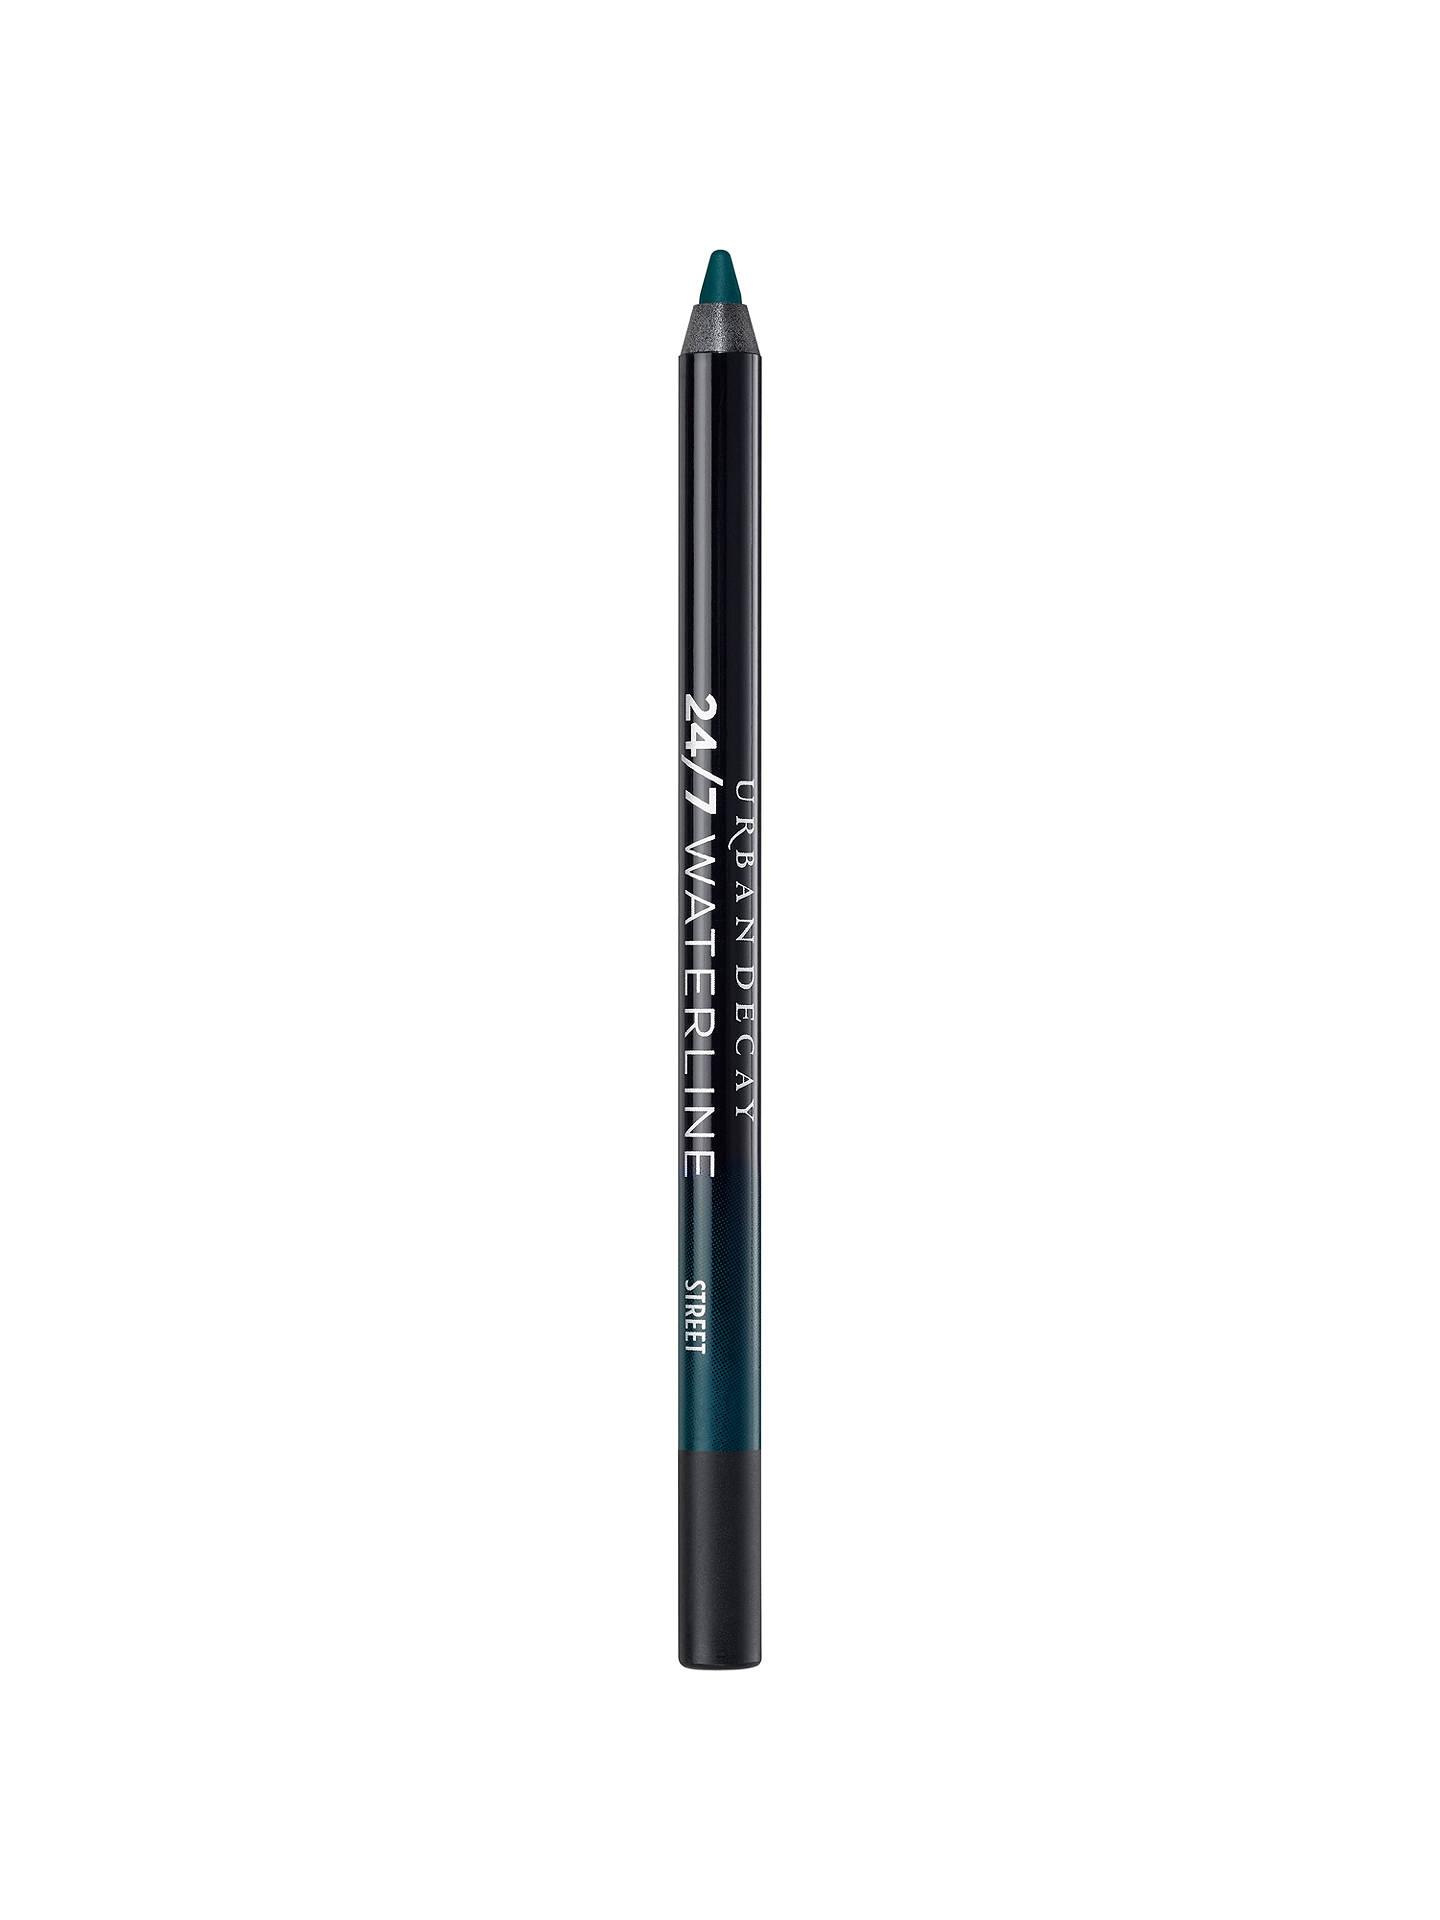 b12a84ca83f Buy Urban Decay 24/7 Waterline Eye Pencil, Green Online at johnlewis.com ...